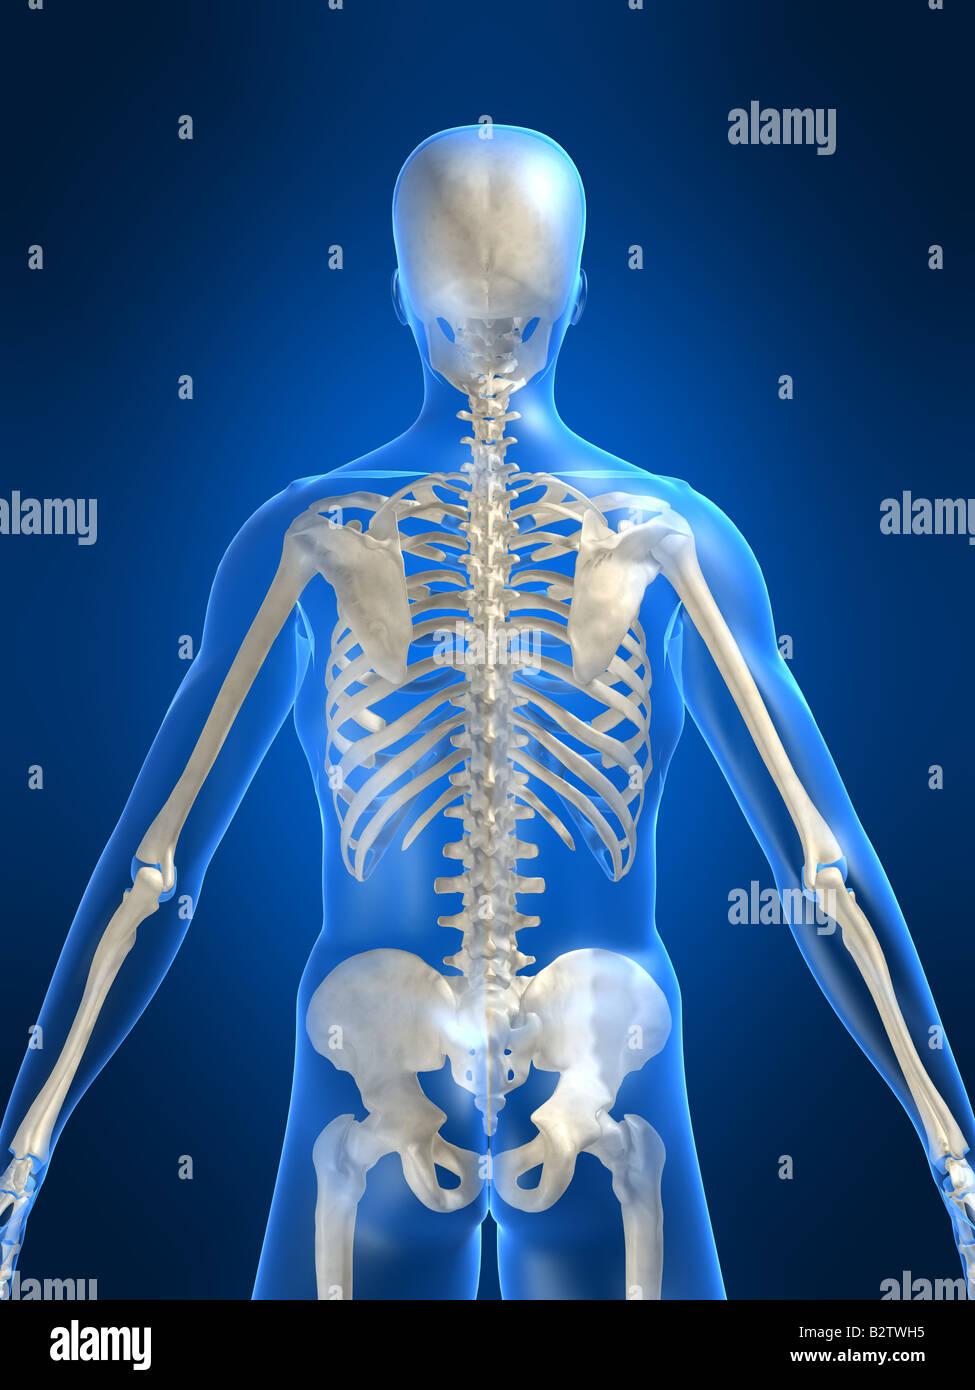 Human Skeleton Backside Stock Photos & Human Skeleton Backside Stock ...